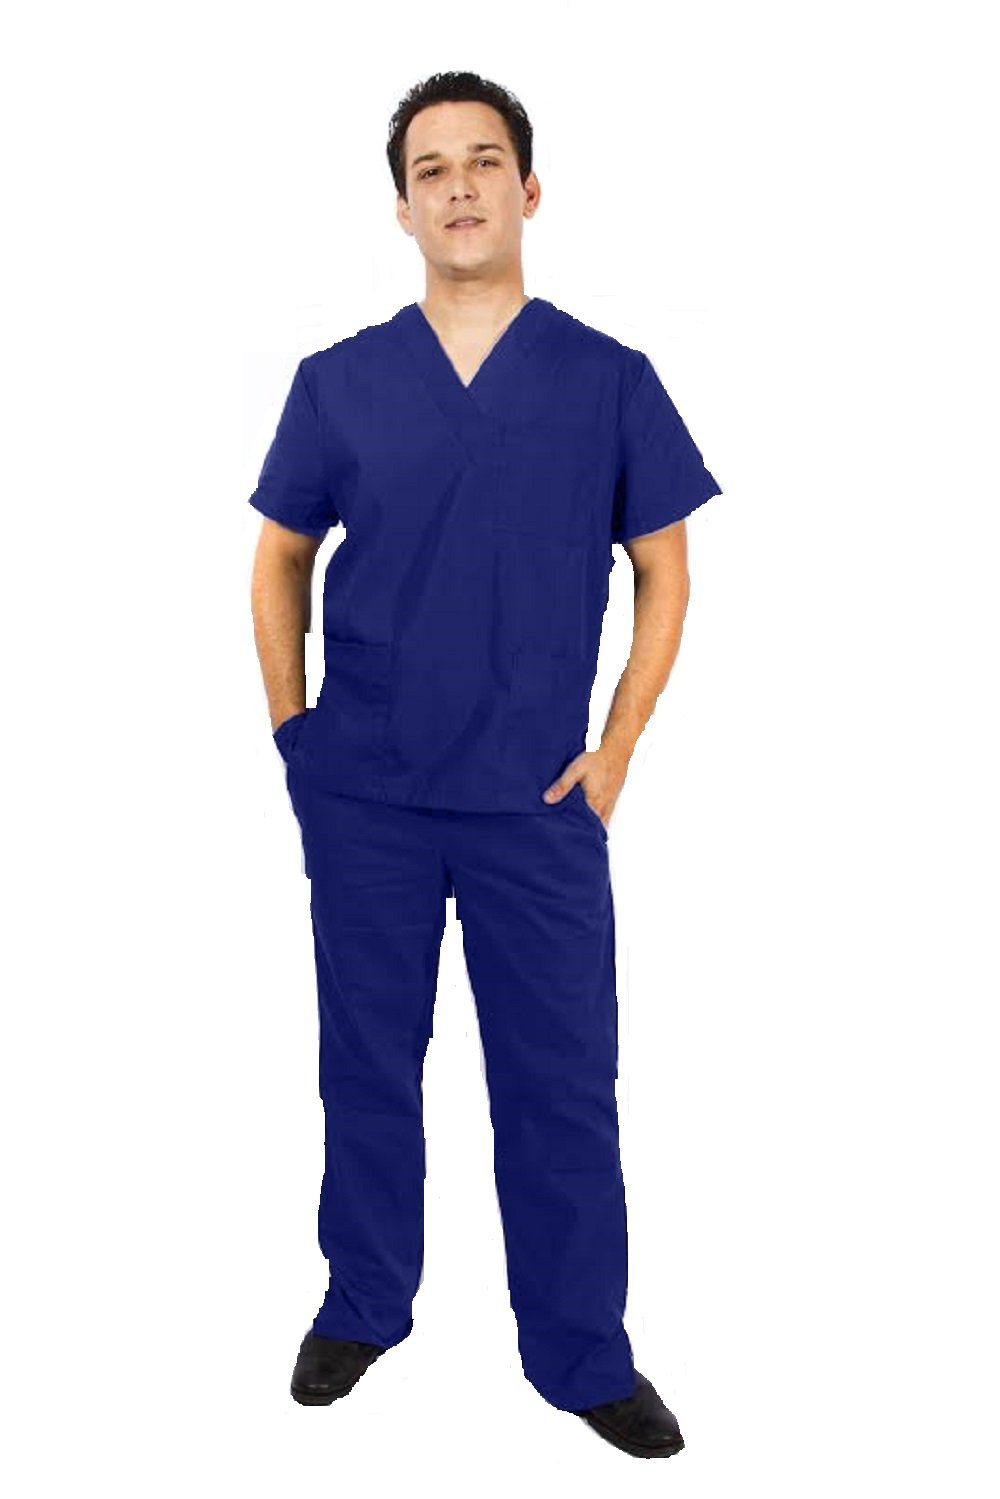 NATURAL UNIFORMS Men's Scrub Set Medical Scrub Top and Pants (XXL, True Navy Blue)